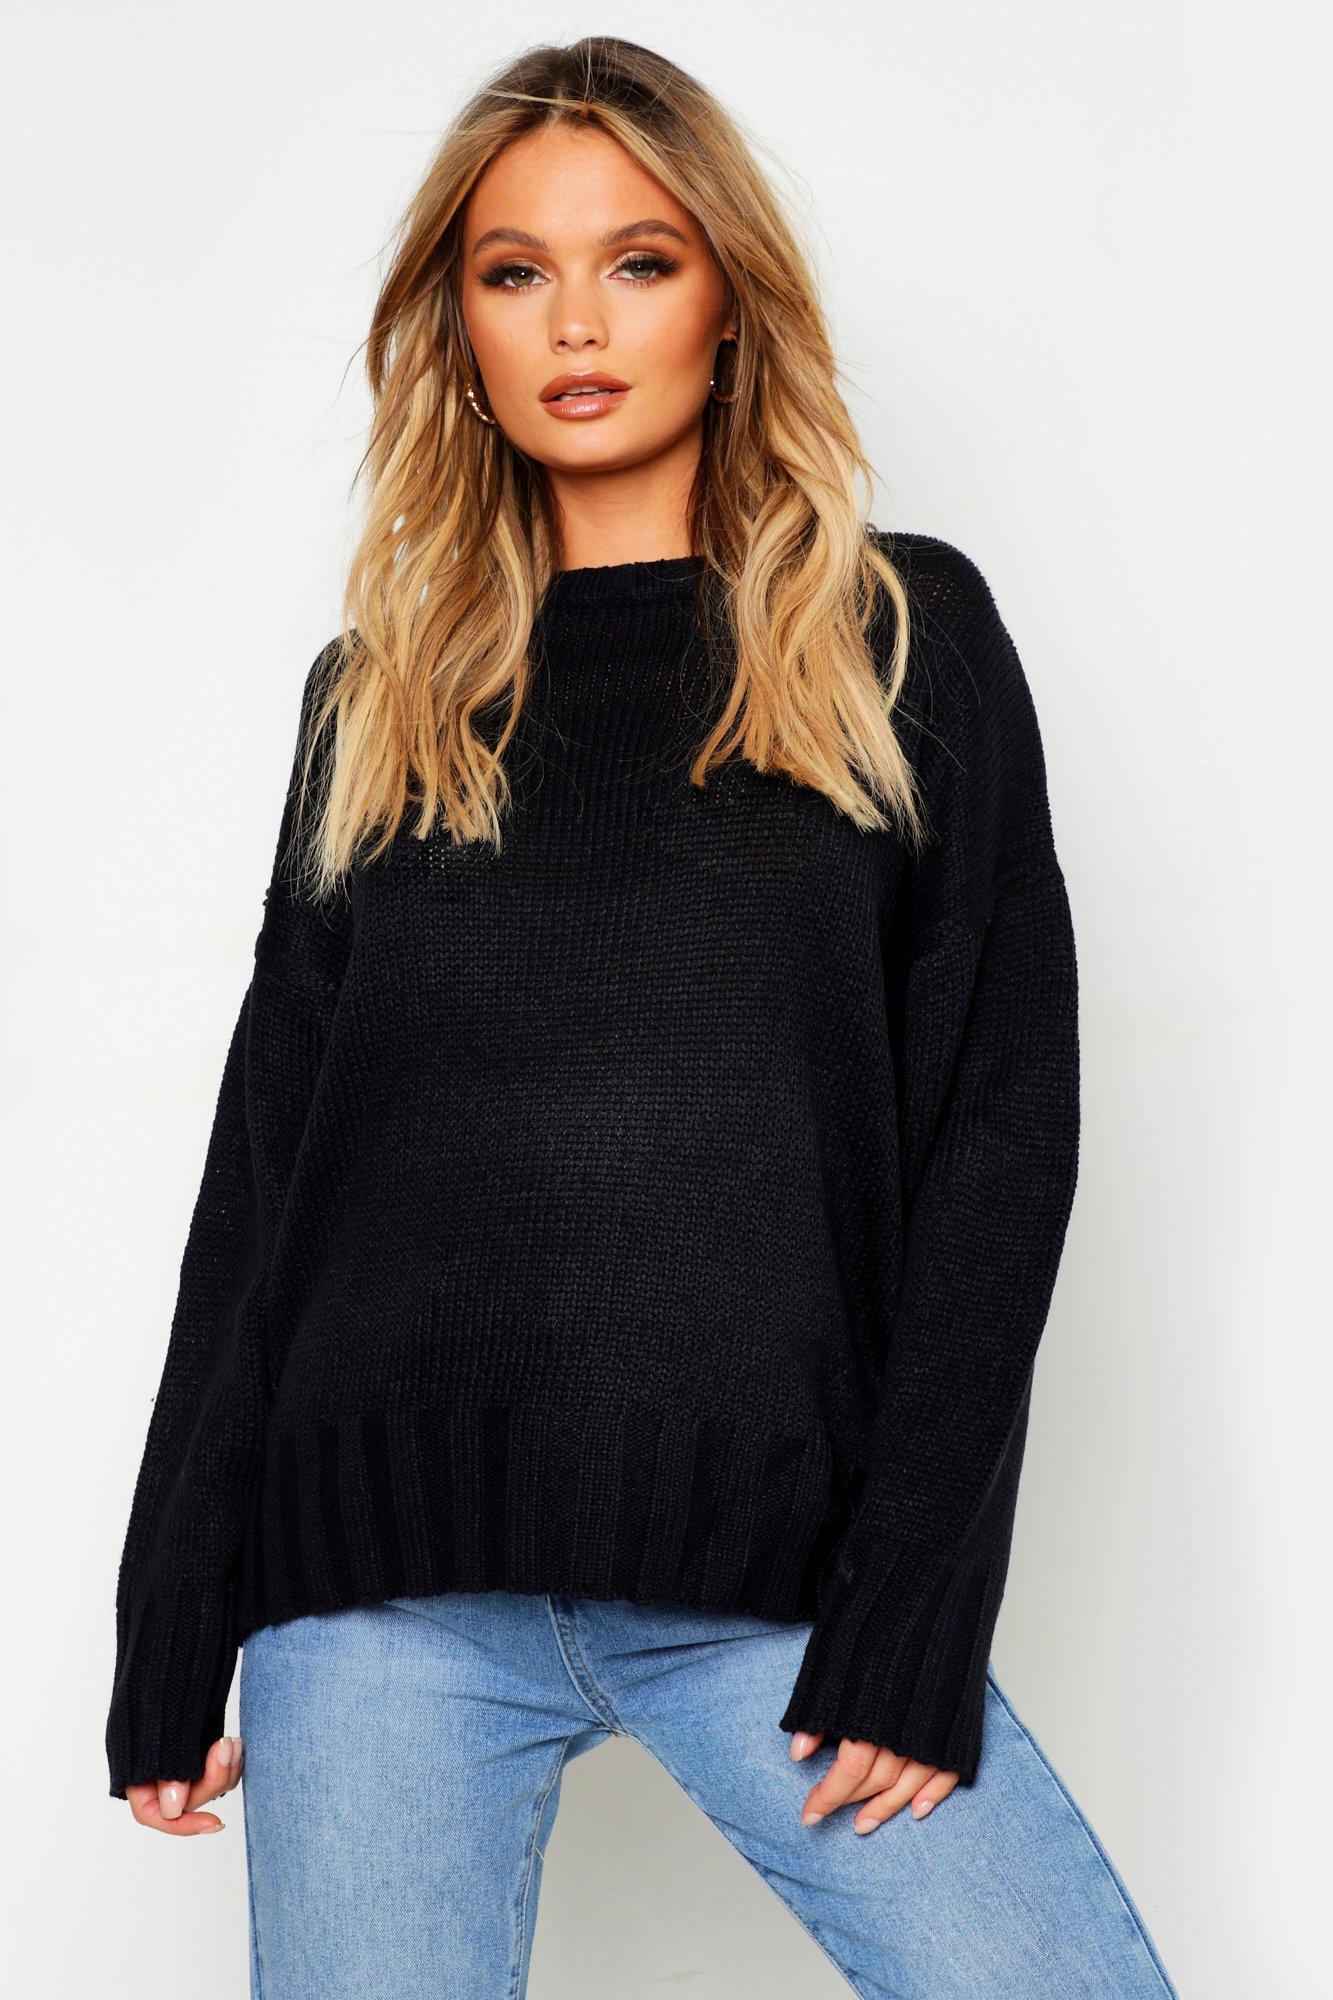 Womens Oversized-Pullover - schwarz - S, Schwarz - Boohoo.com